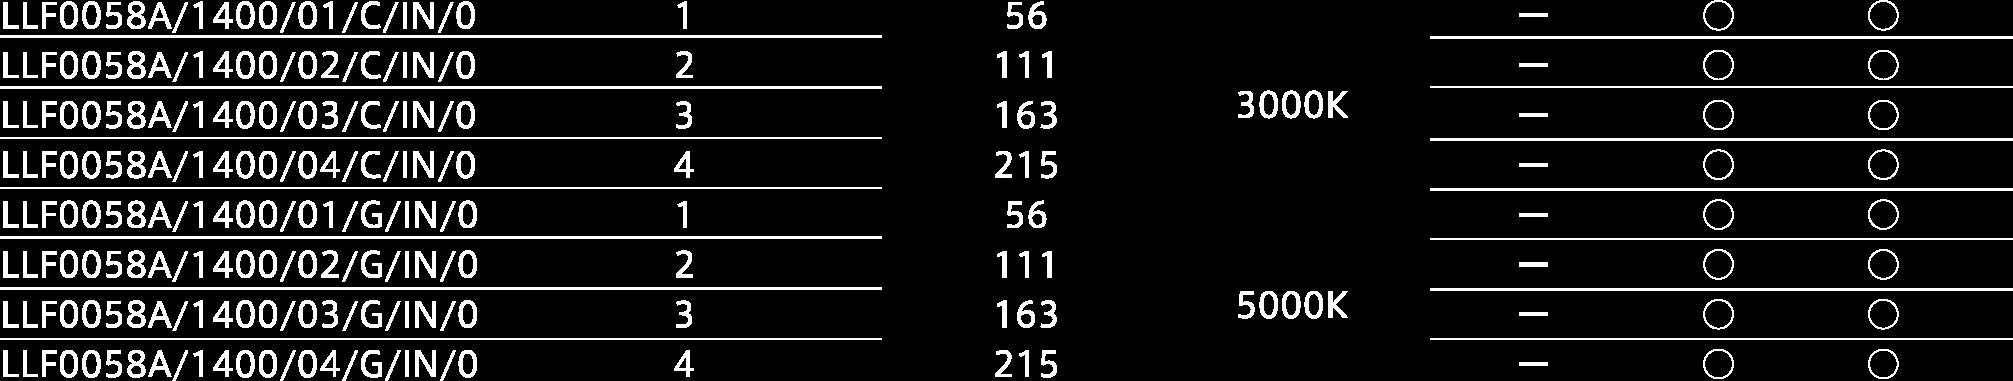 LLF0058A spec list